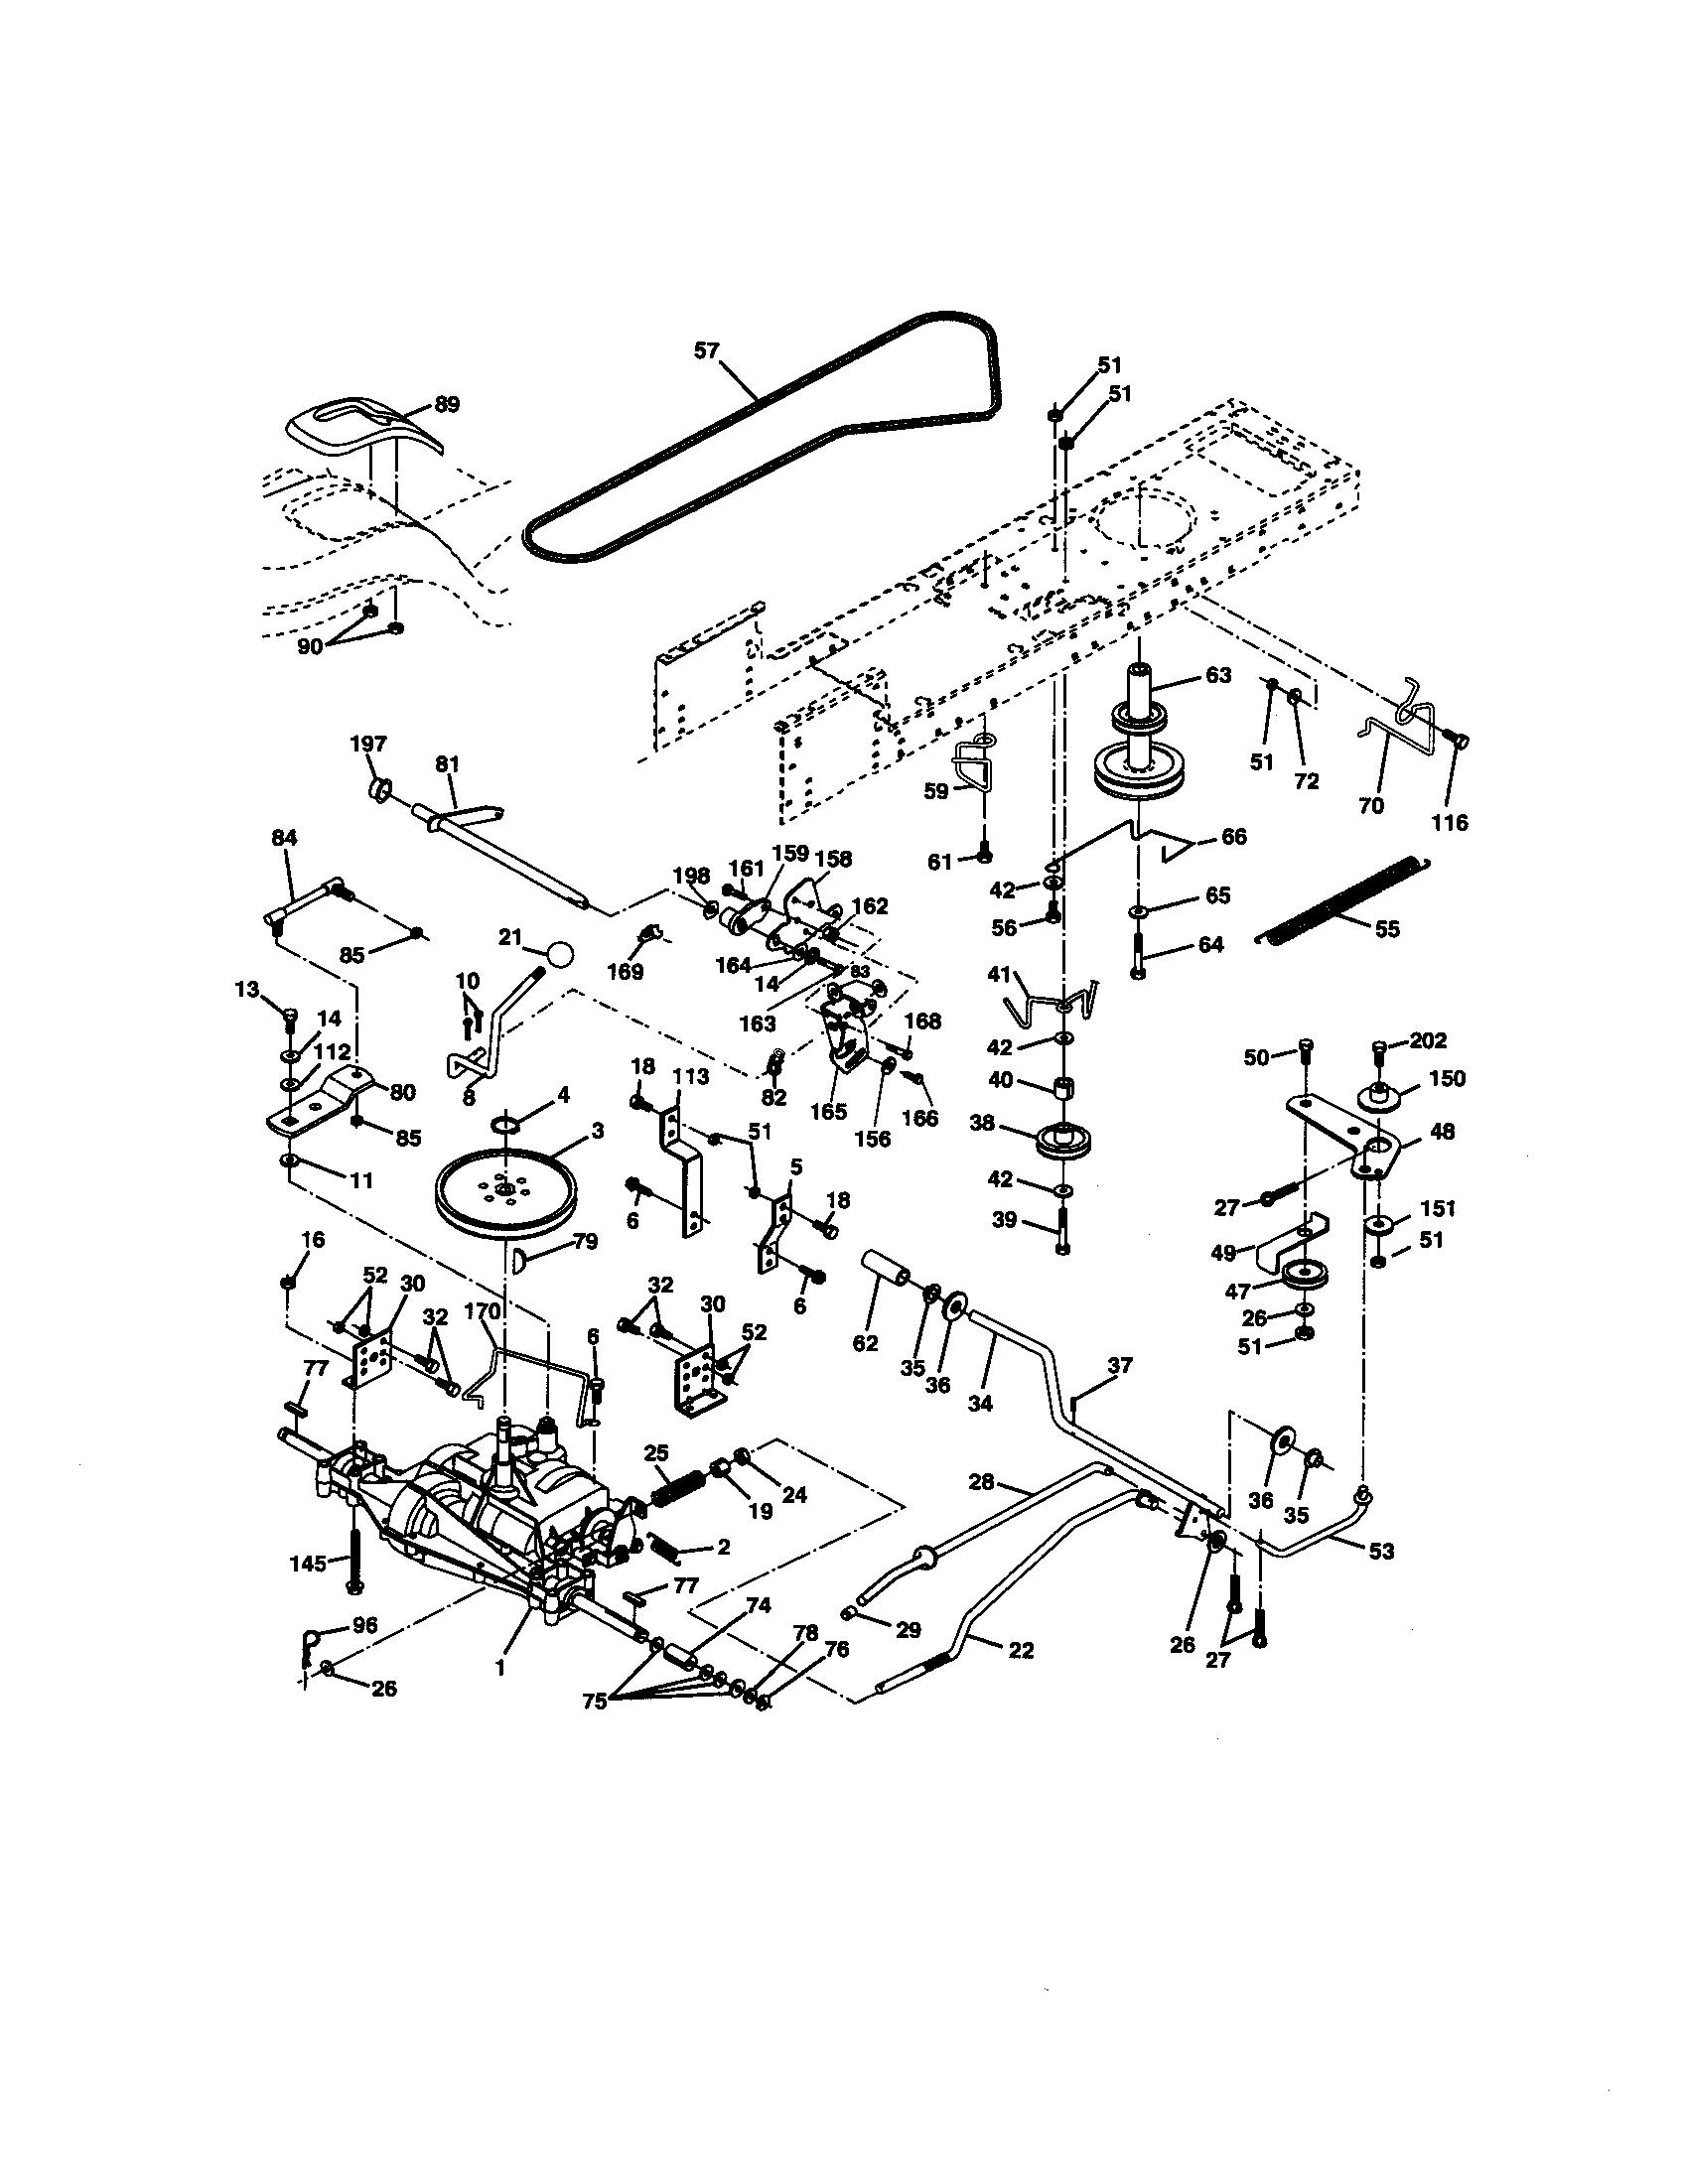 craftsman lt2000 parts manual download